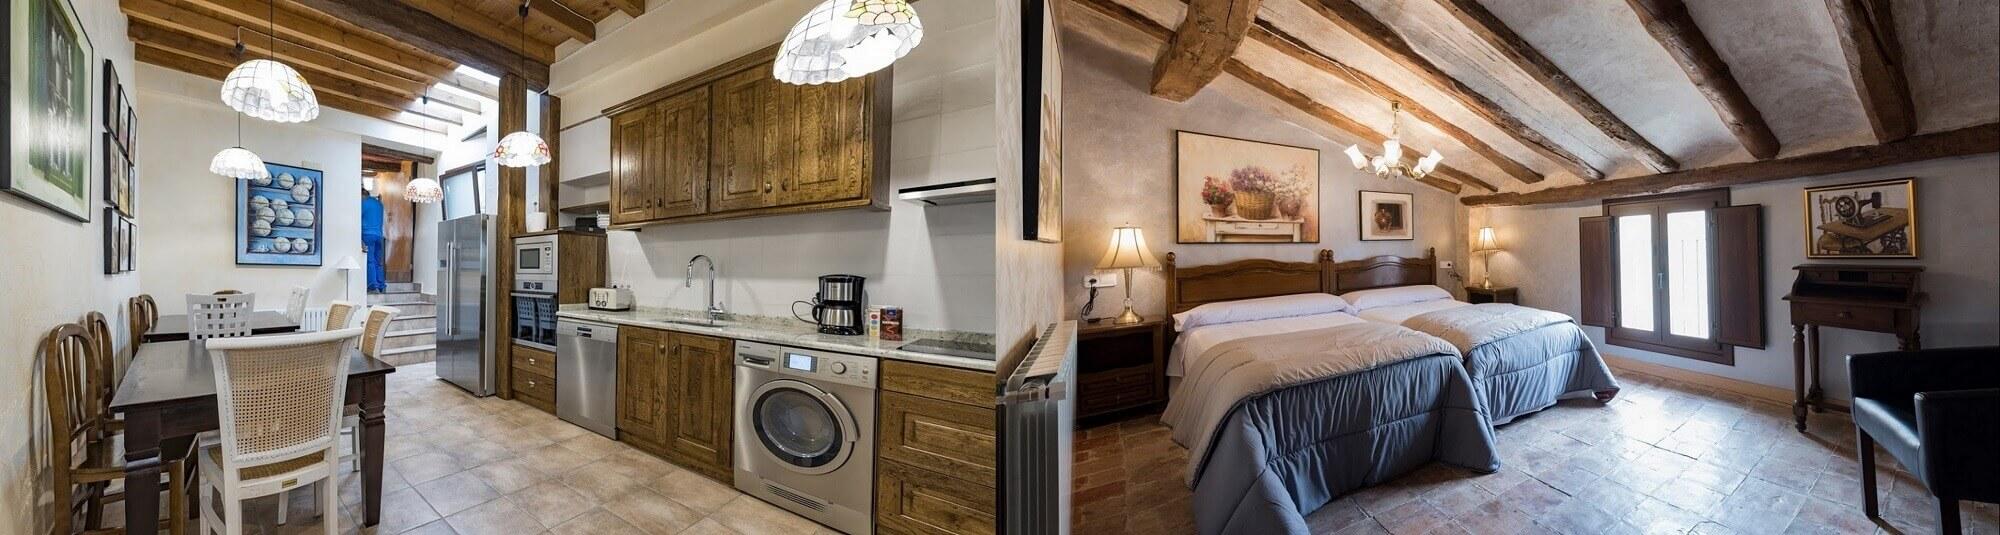 Casa Rural Navarra kitchen and bedroom